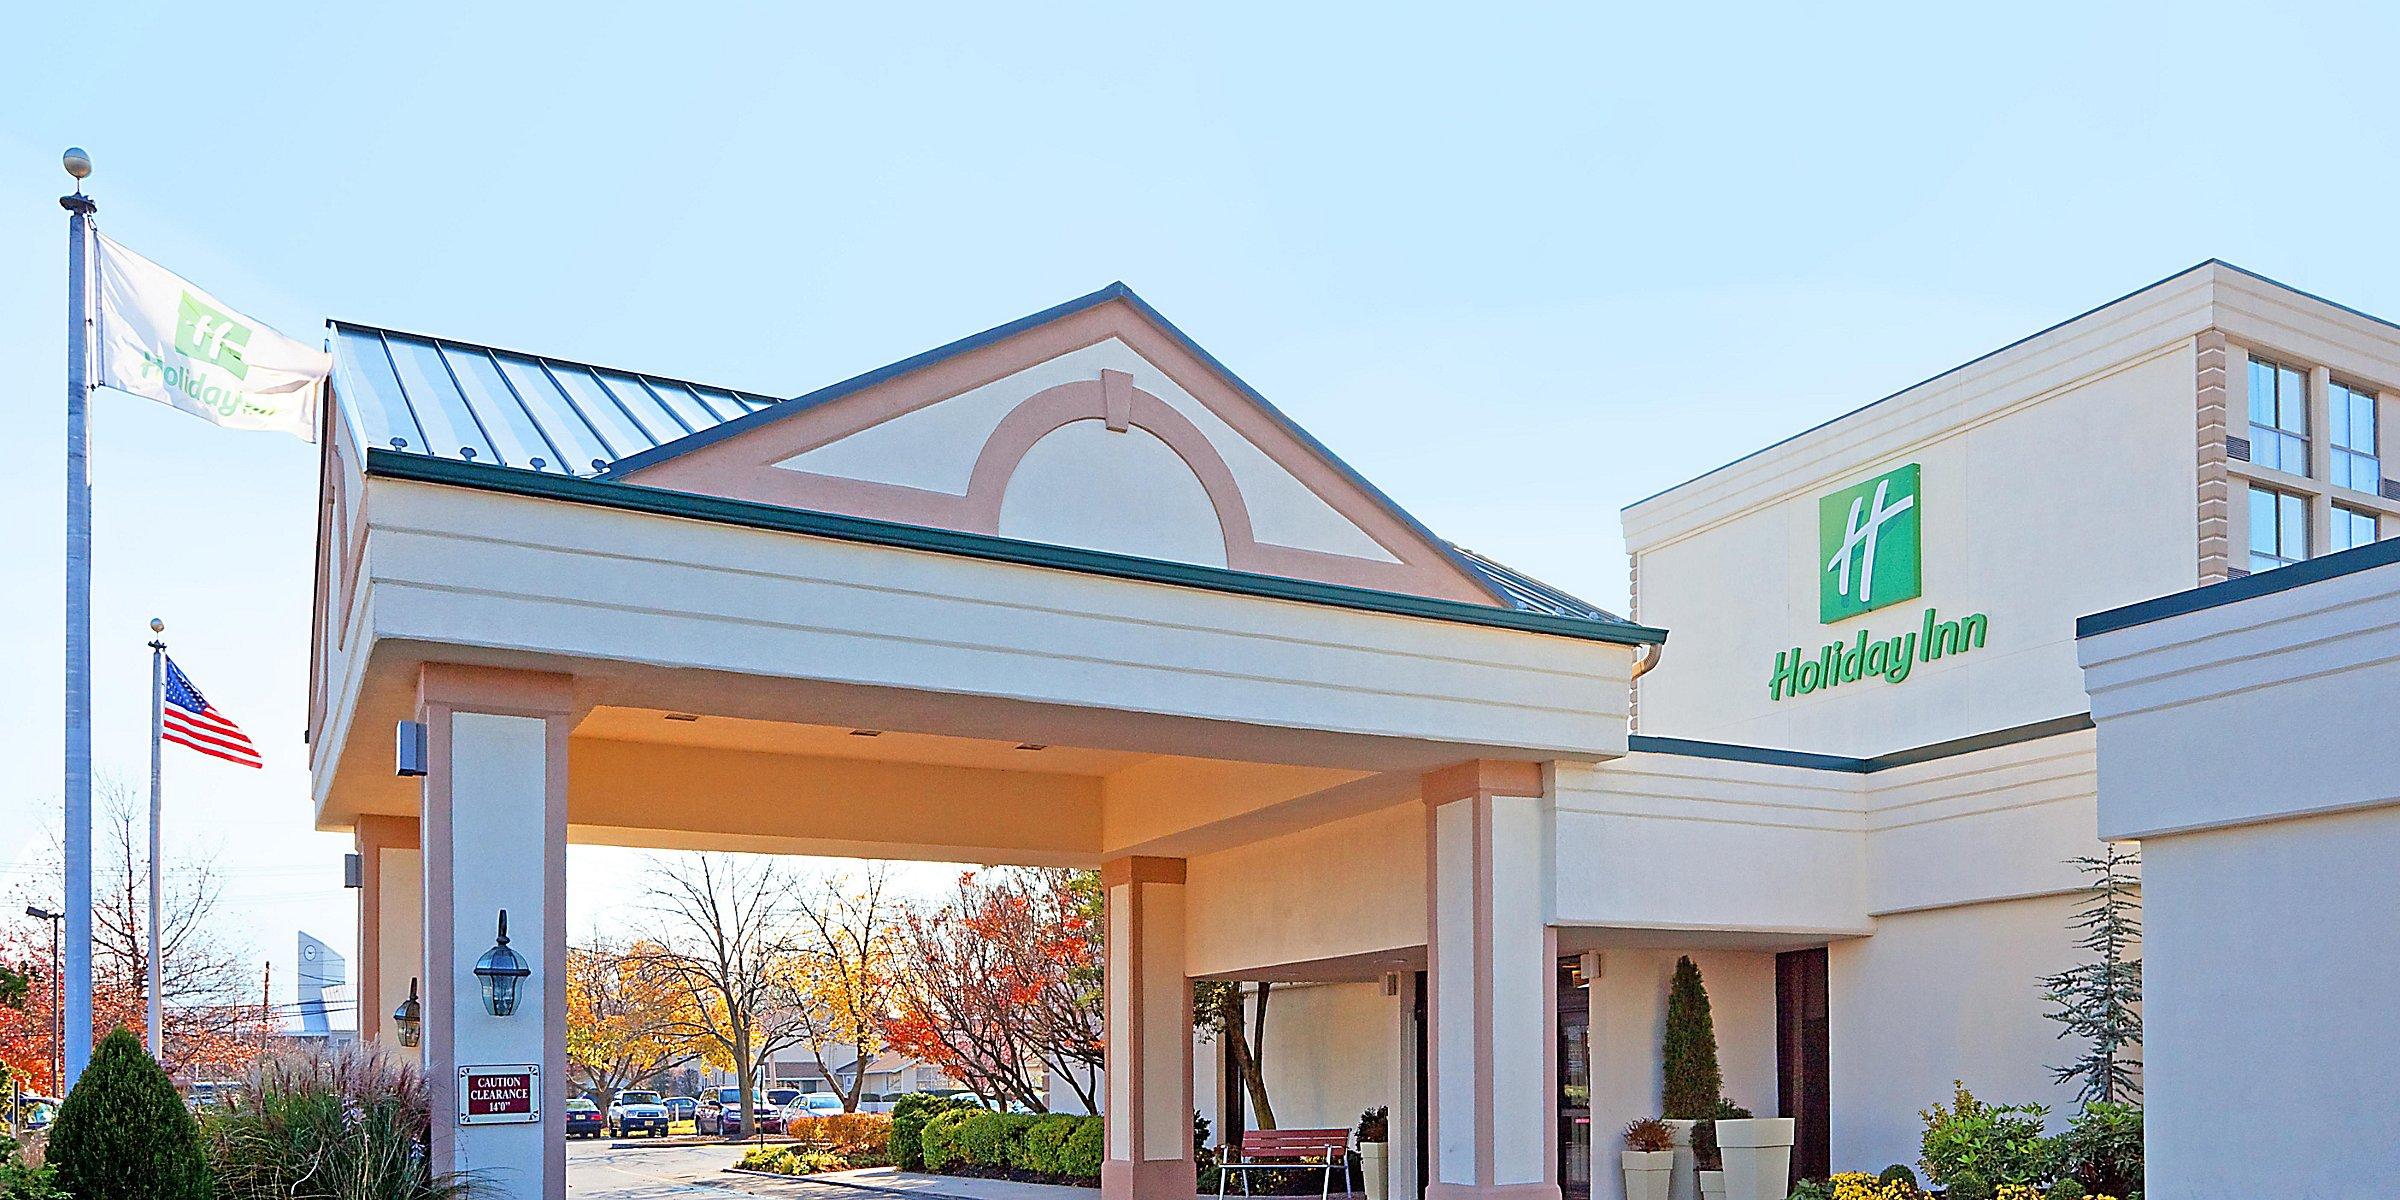 Pet-Friendly Hotels Near Philadelphia in Cherry Hill, NJ | Holiday